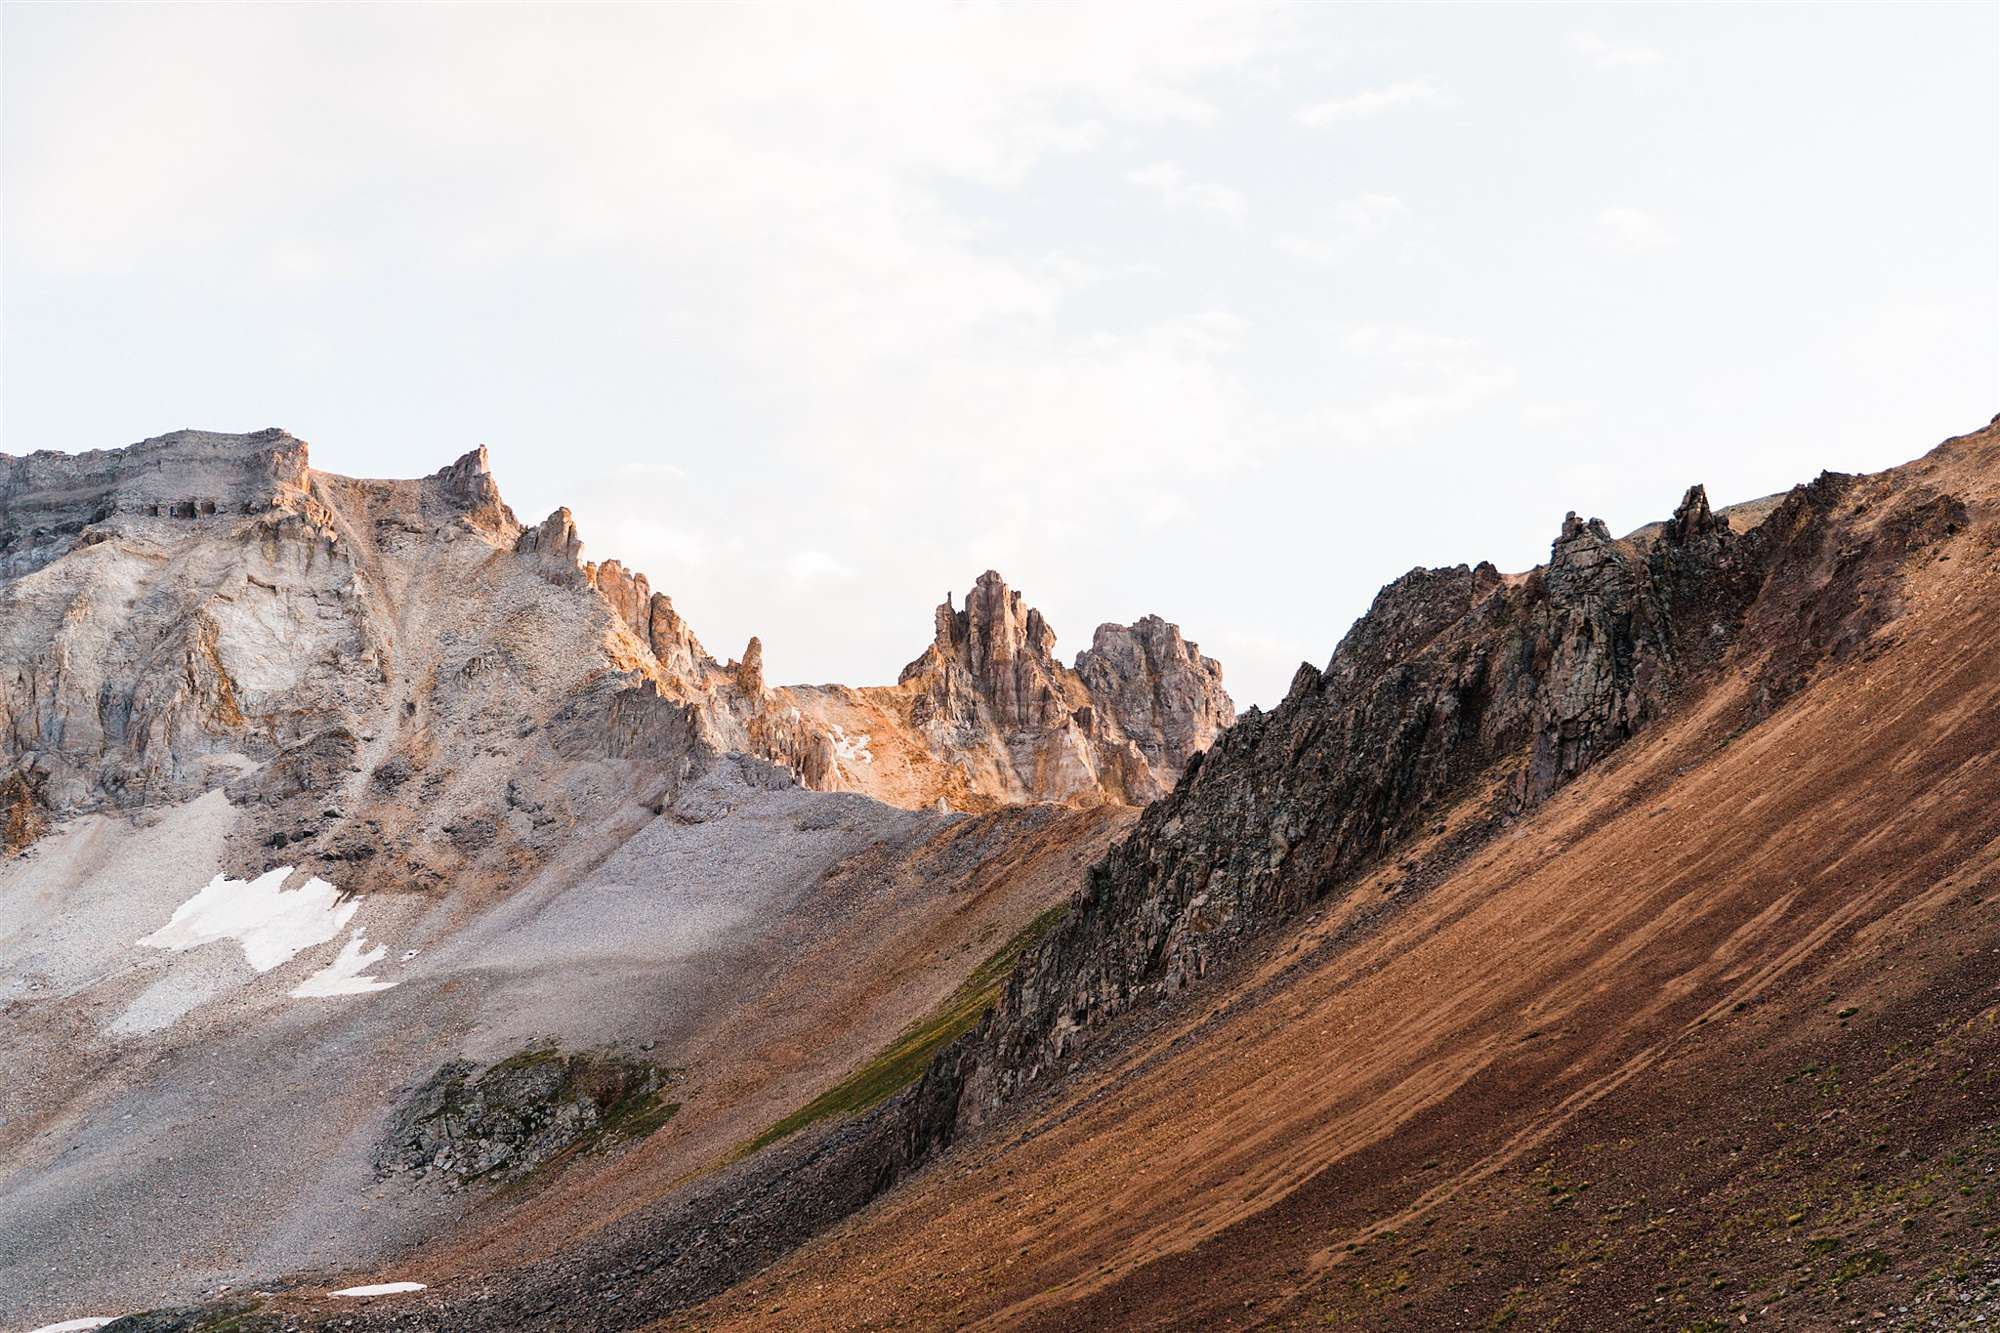 Colorado_Jeeping_Elopement_Emily_Matt_The_Foxes_Photography_0043.jpg